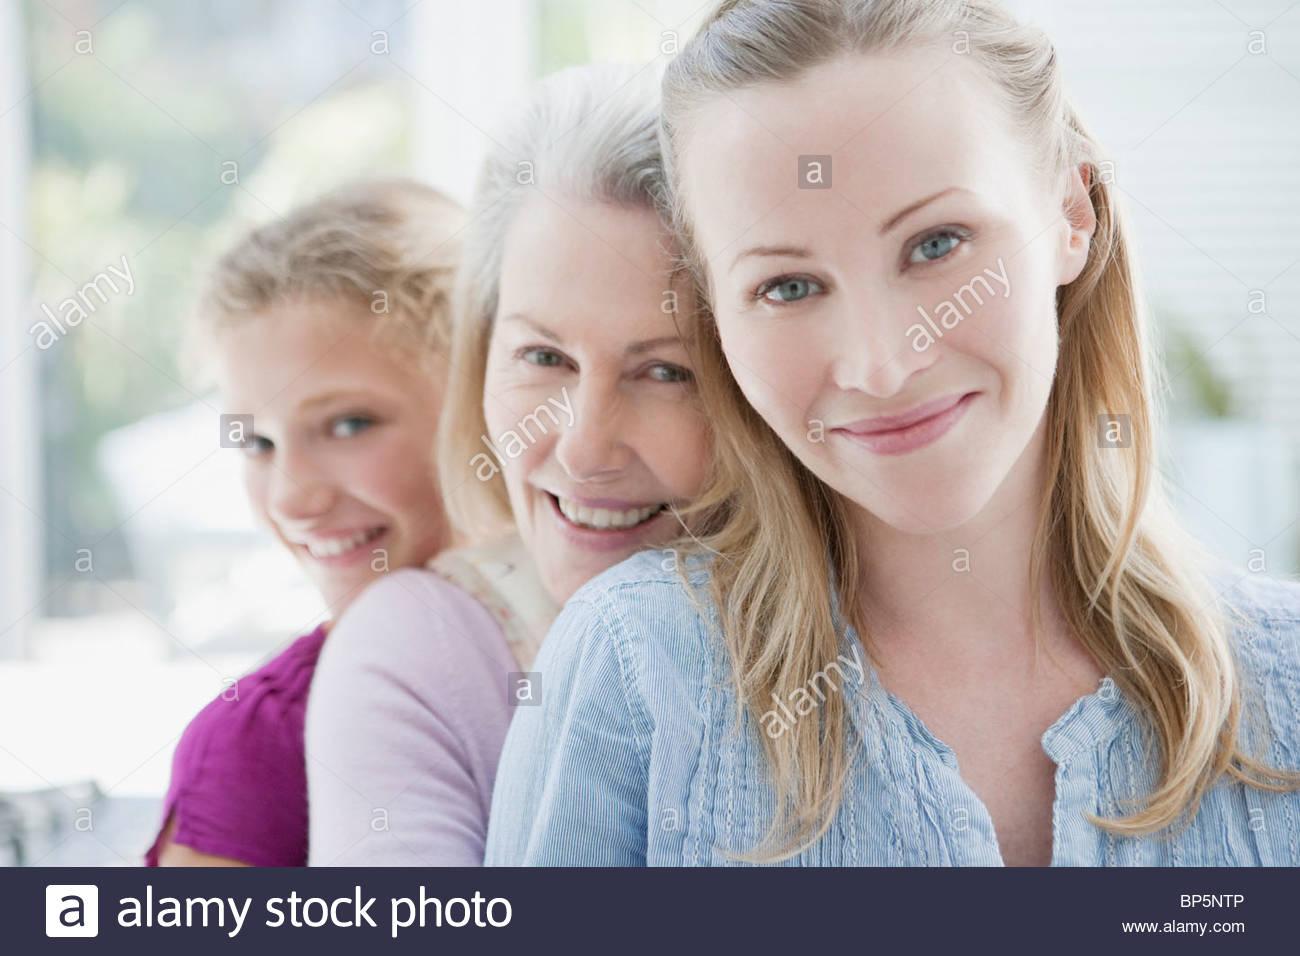 Sonriente, abuela, madre e hija abrazando Imagen De Stock